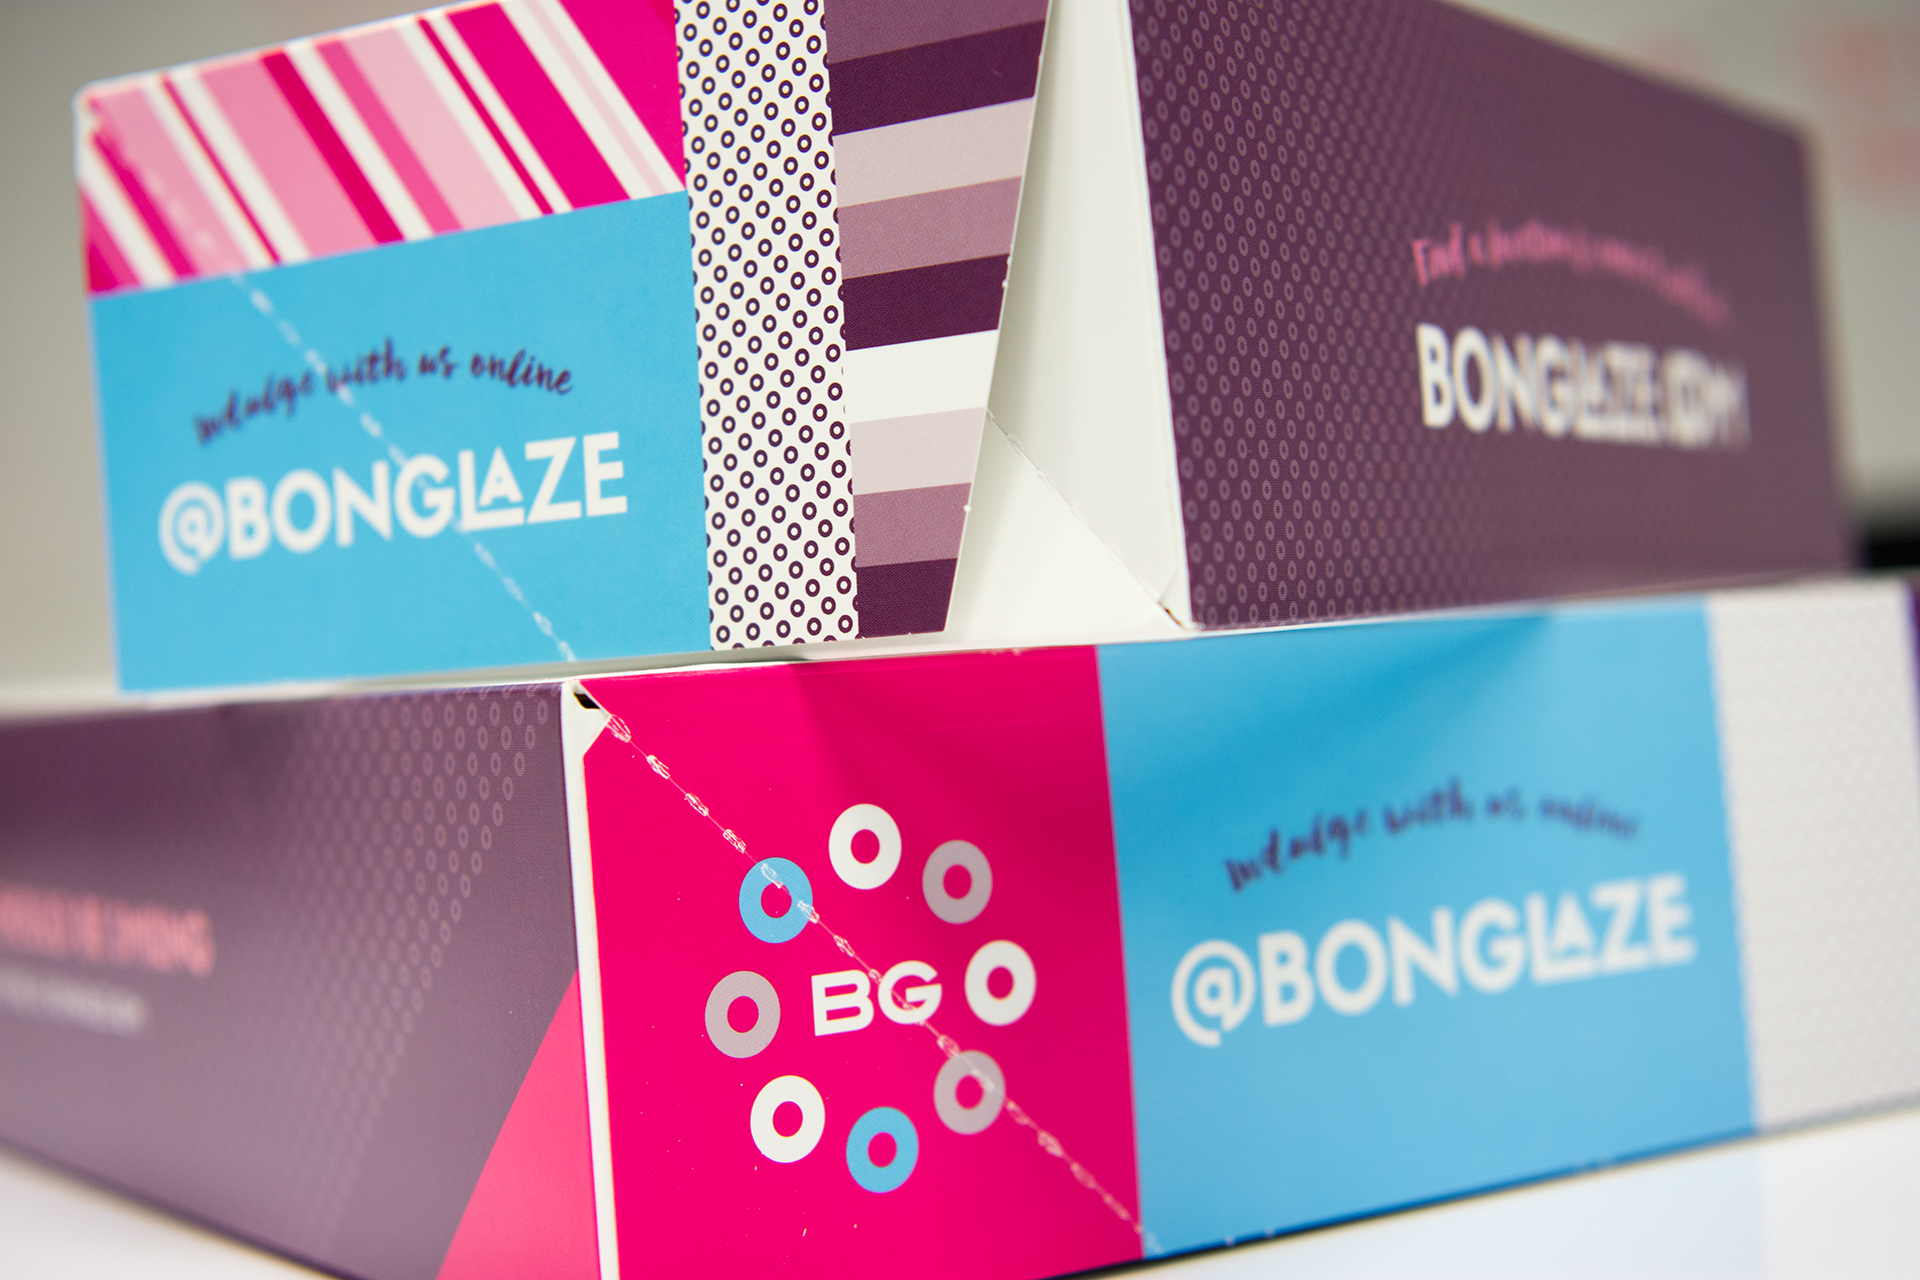 Bon Glaze doughnut and coffee restaurant branding and package design by Vigor in Atlanta, Georgia